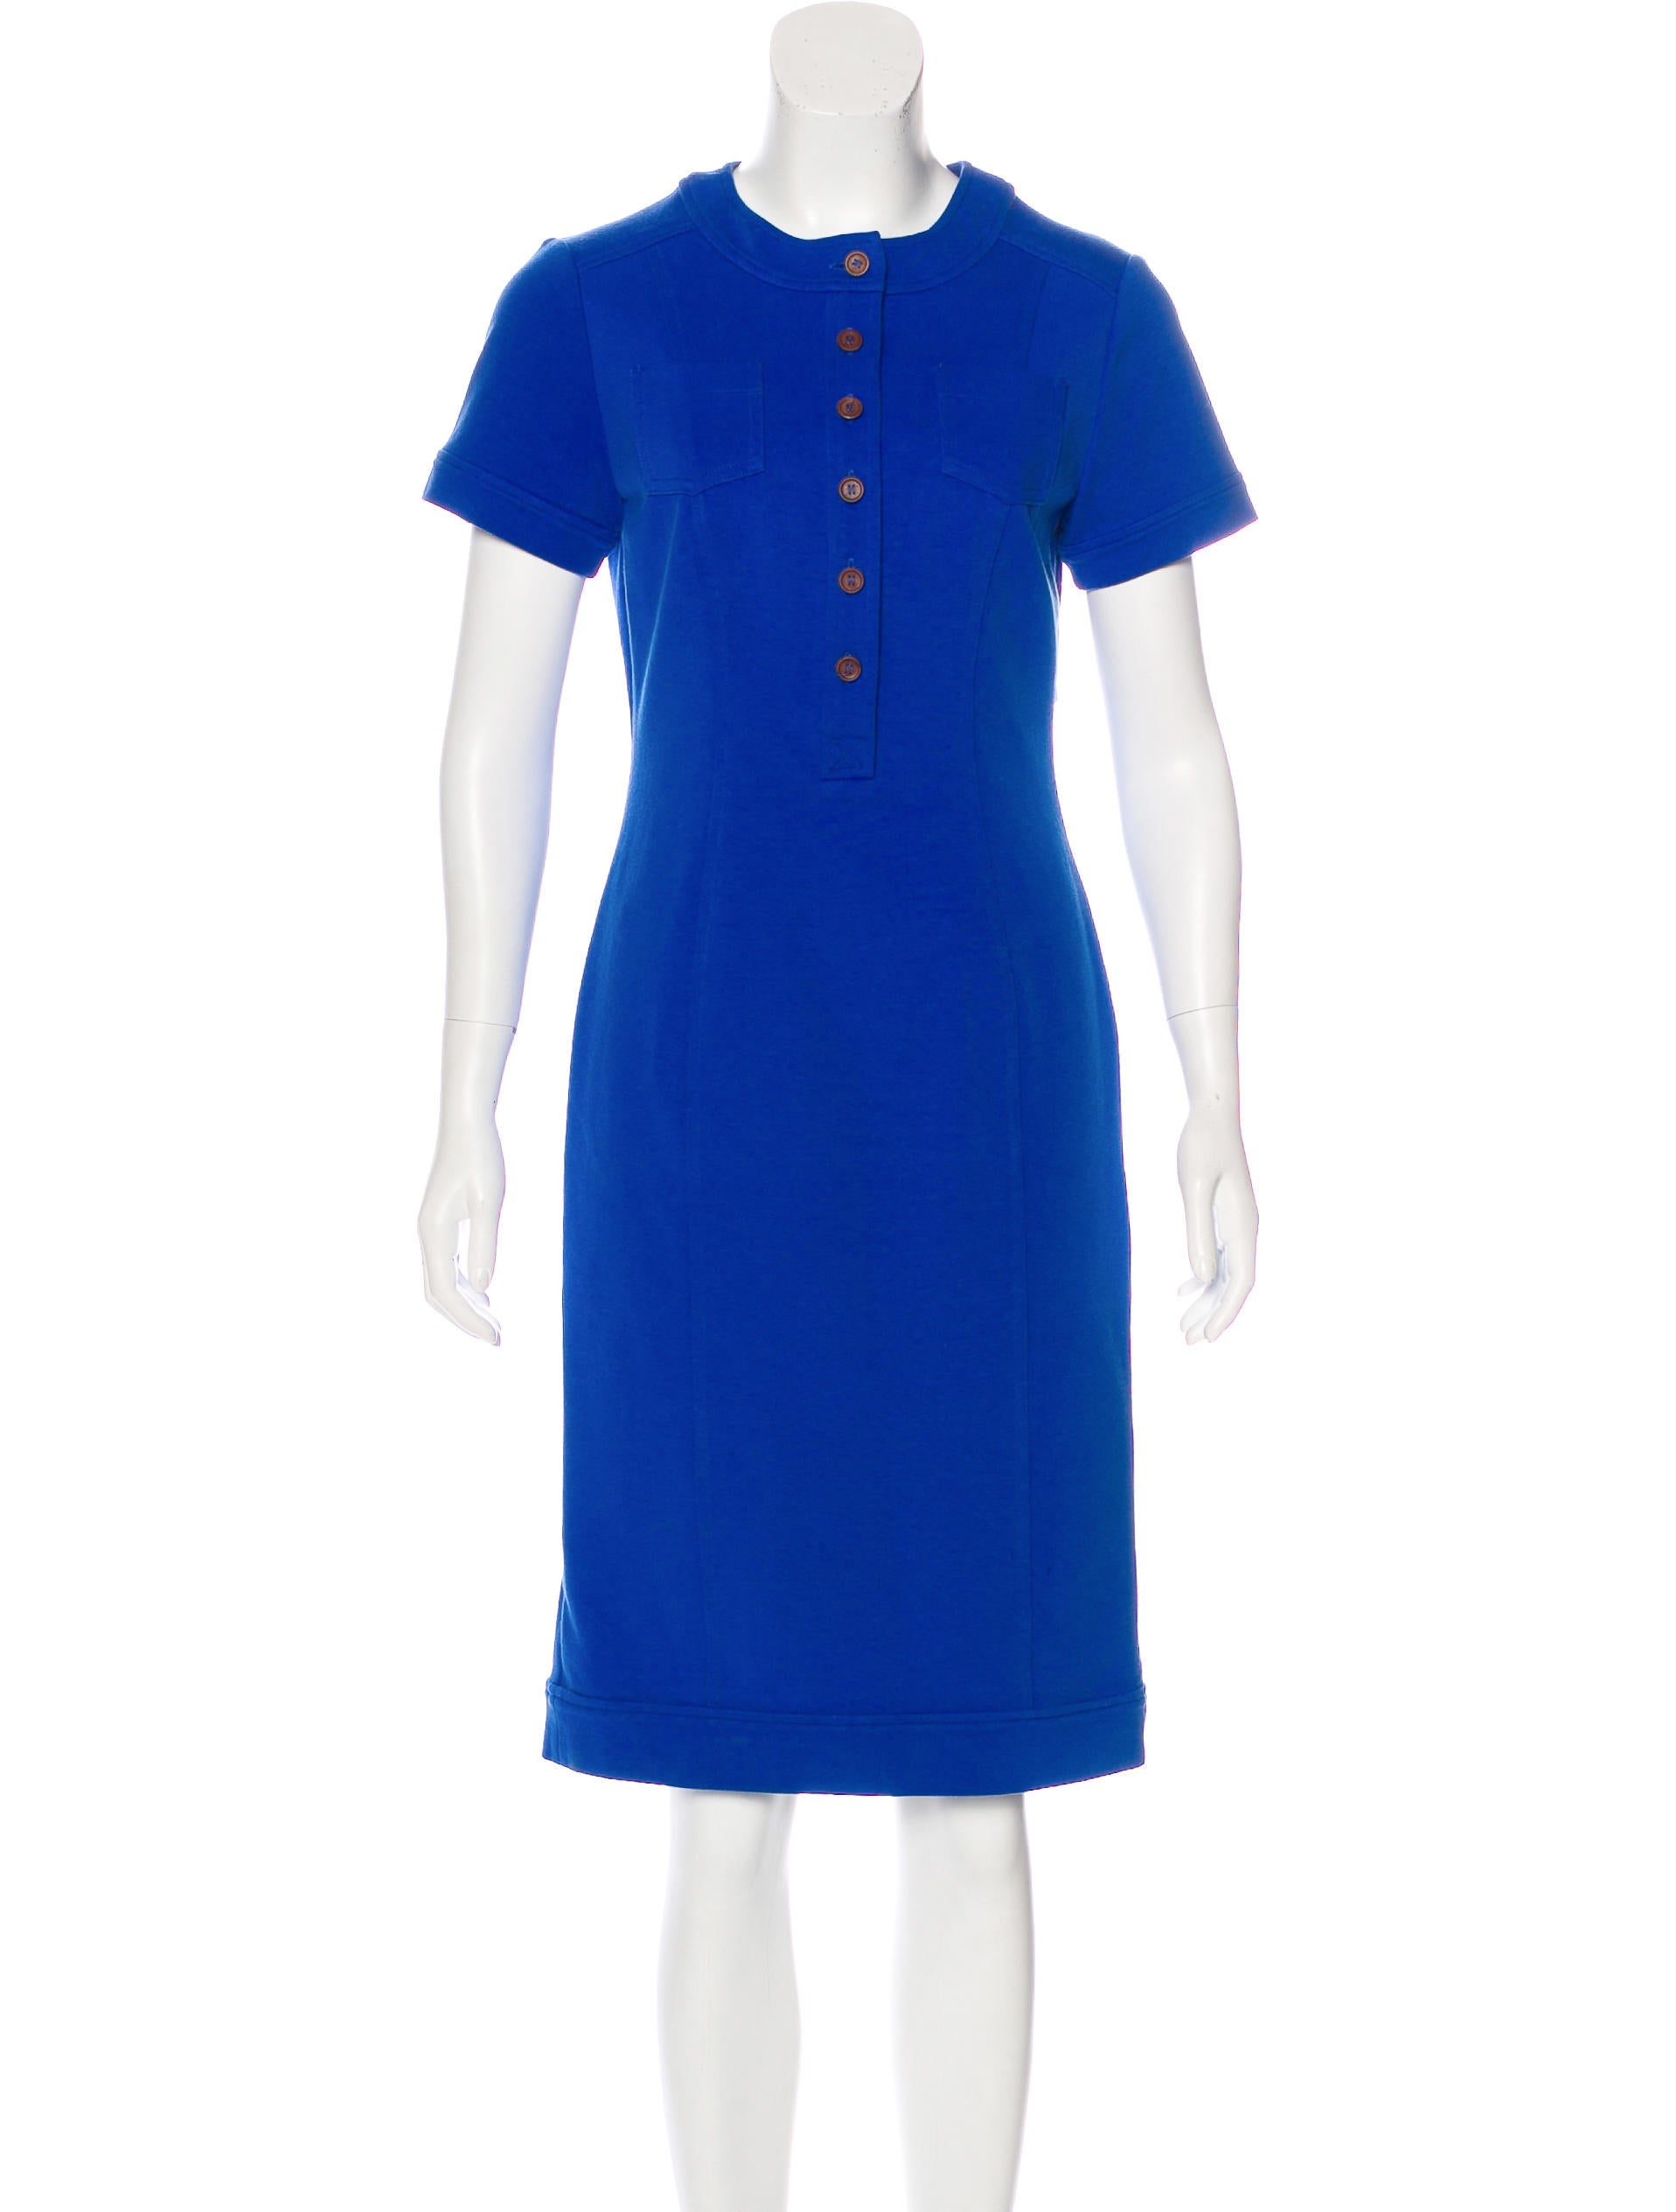 Diane von furstenberg midi shirt dress dresses for Diane von furstenberg shirt